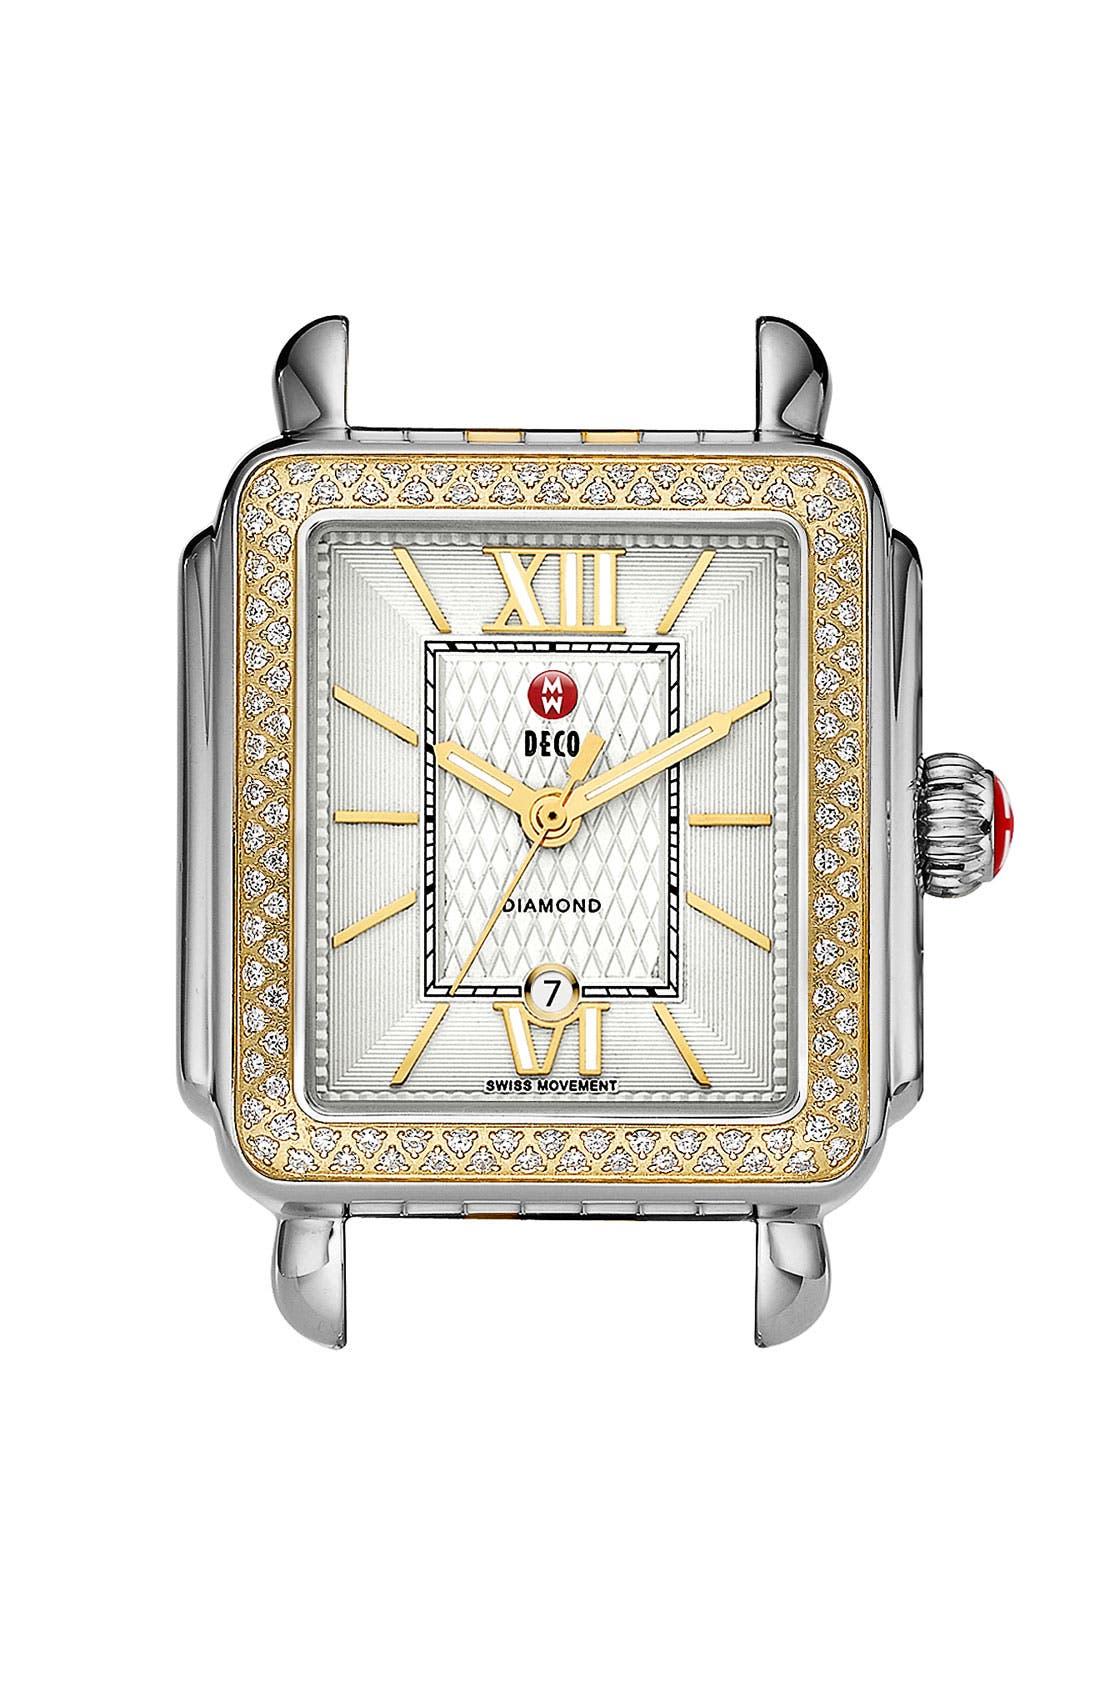 Main Image - MICHELE 'Deco Diamond' Guilloche Dial Watch Case, 33mm x 35mm